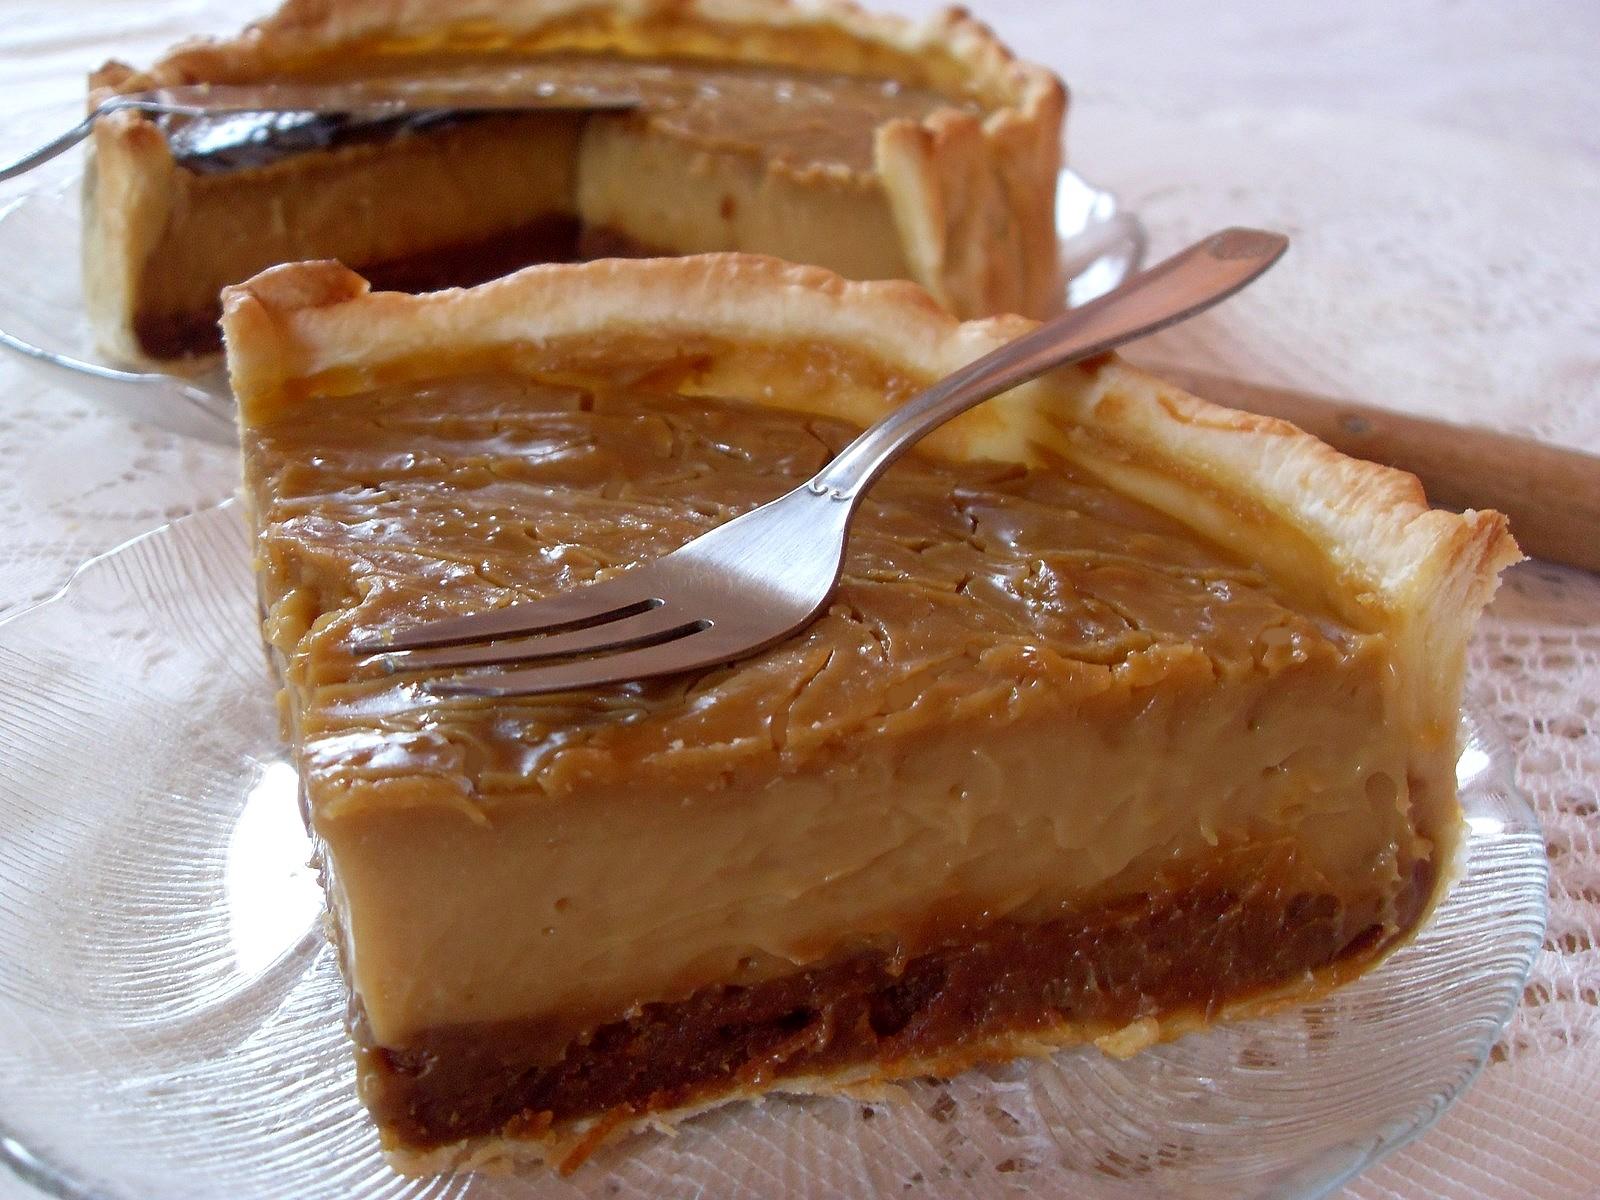 Ma cuisine v g talienne tarte au flan caramel pain d for Amande cuisine bjorg